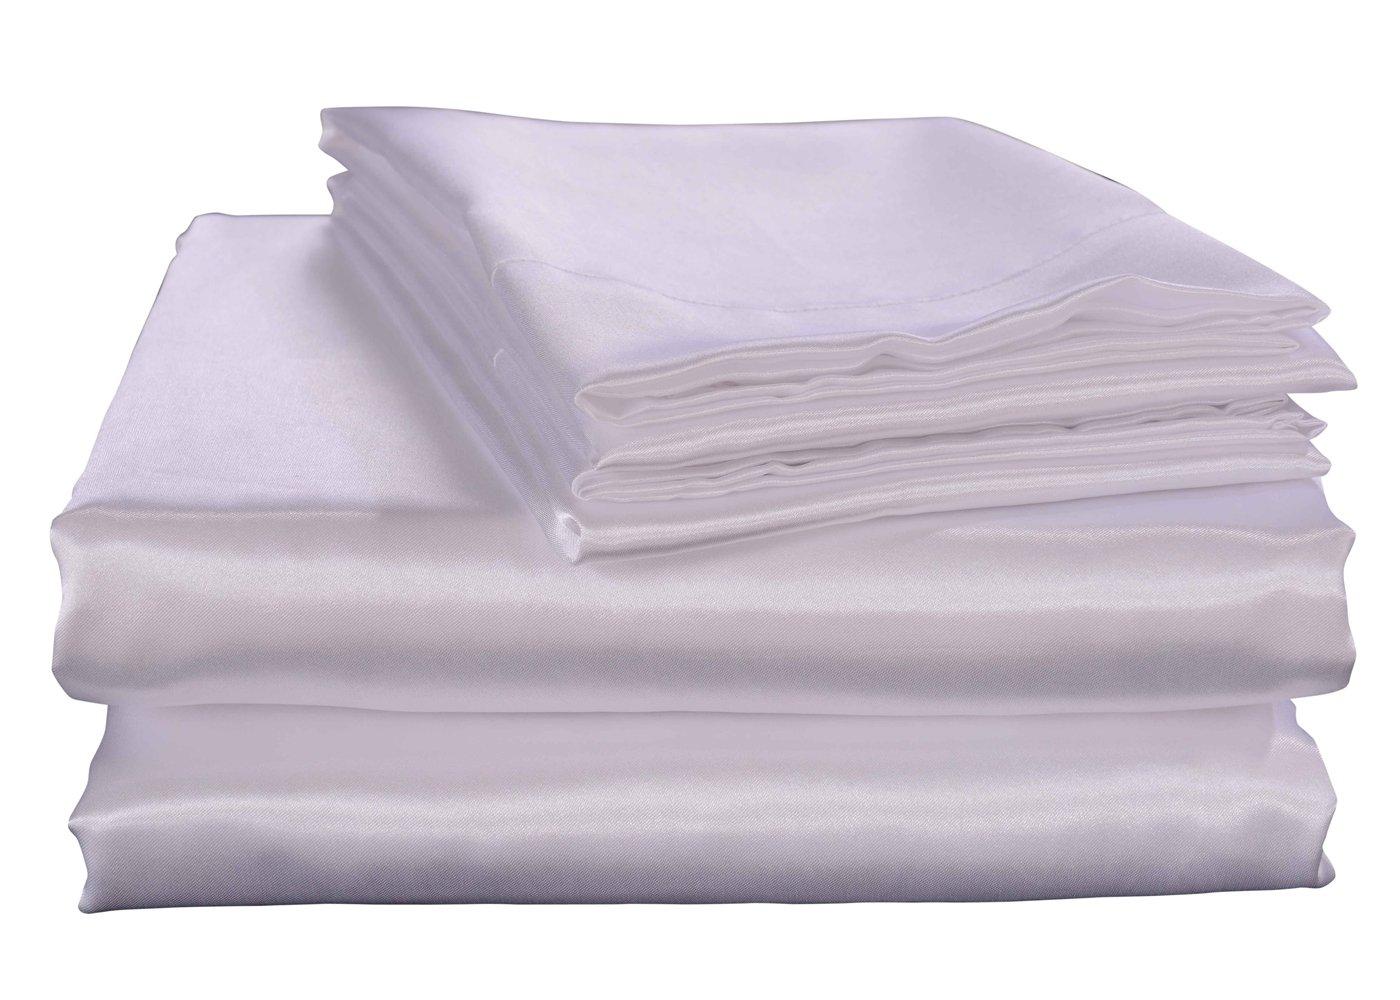 amazon com honeymoon luxury satin bed sheet set ultra silky soft